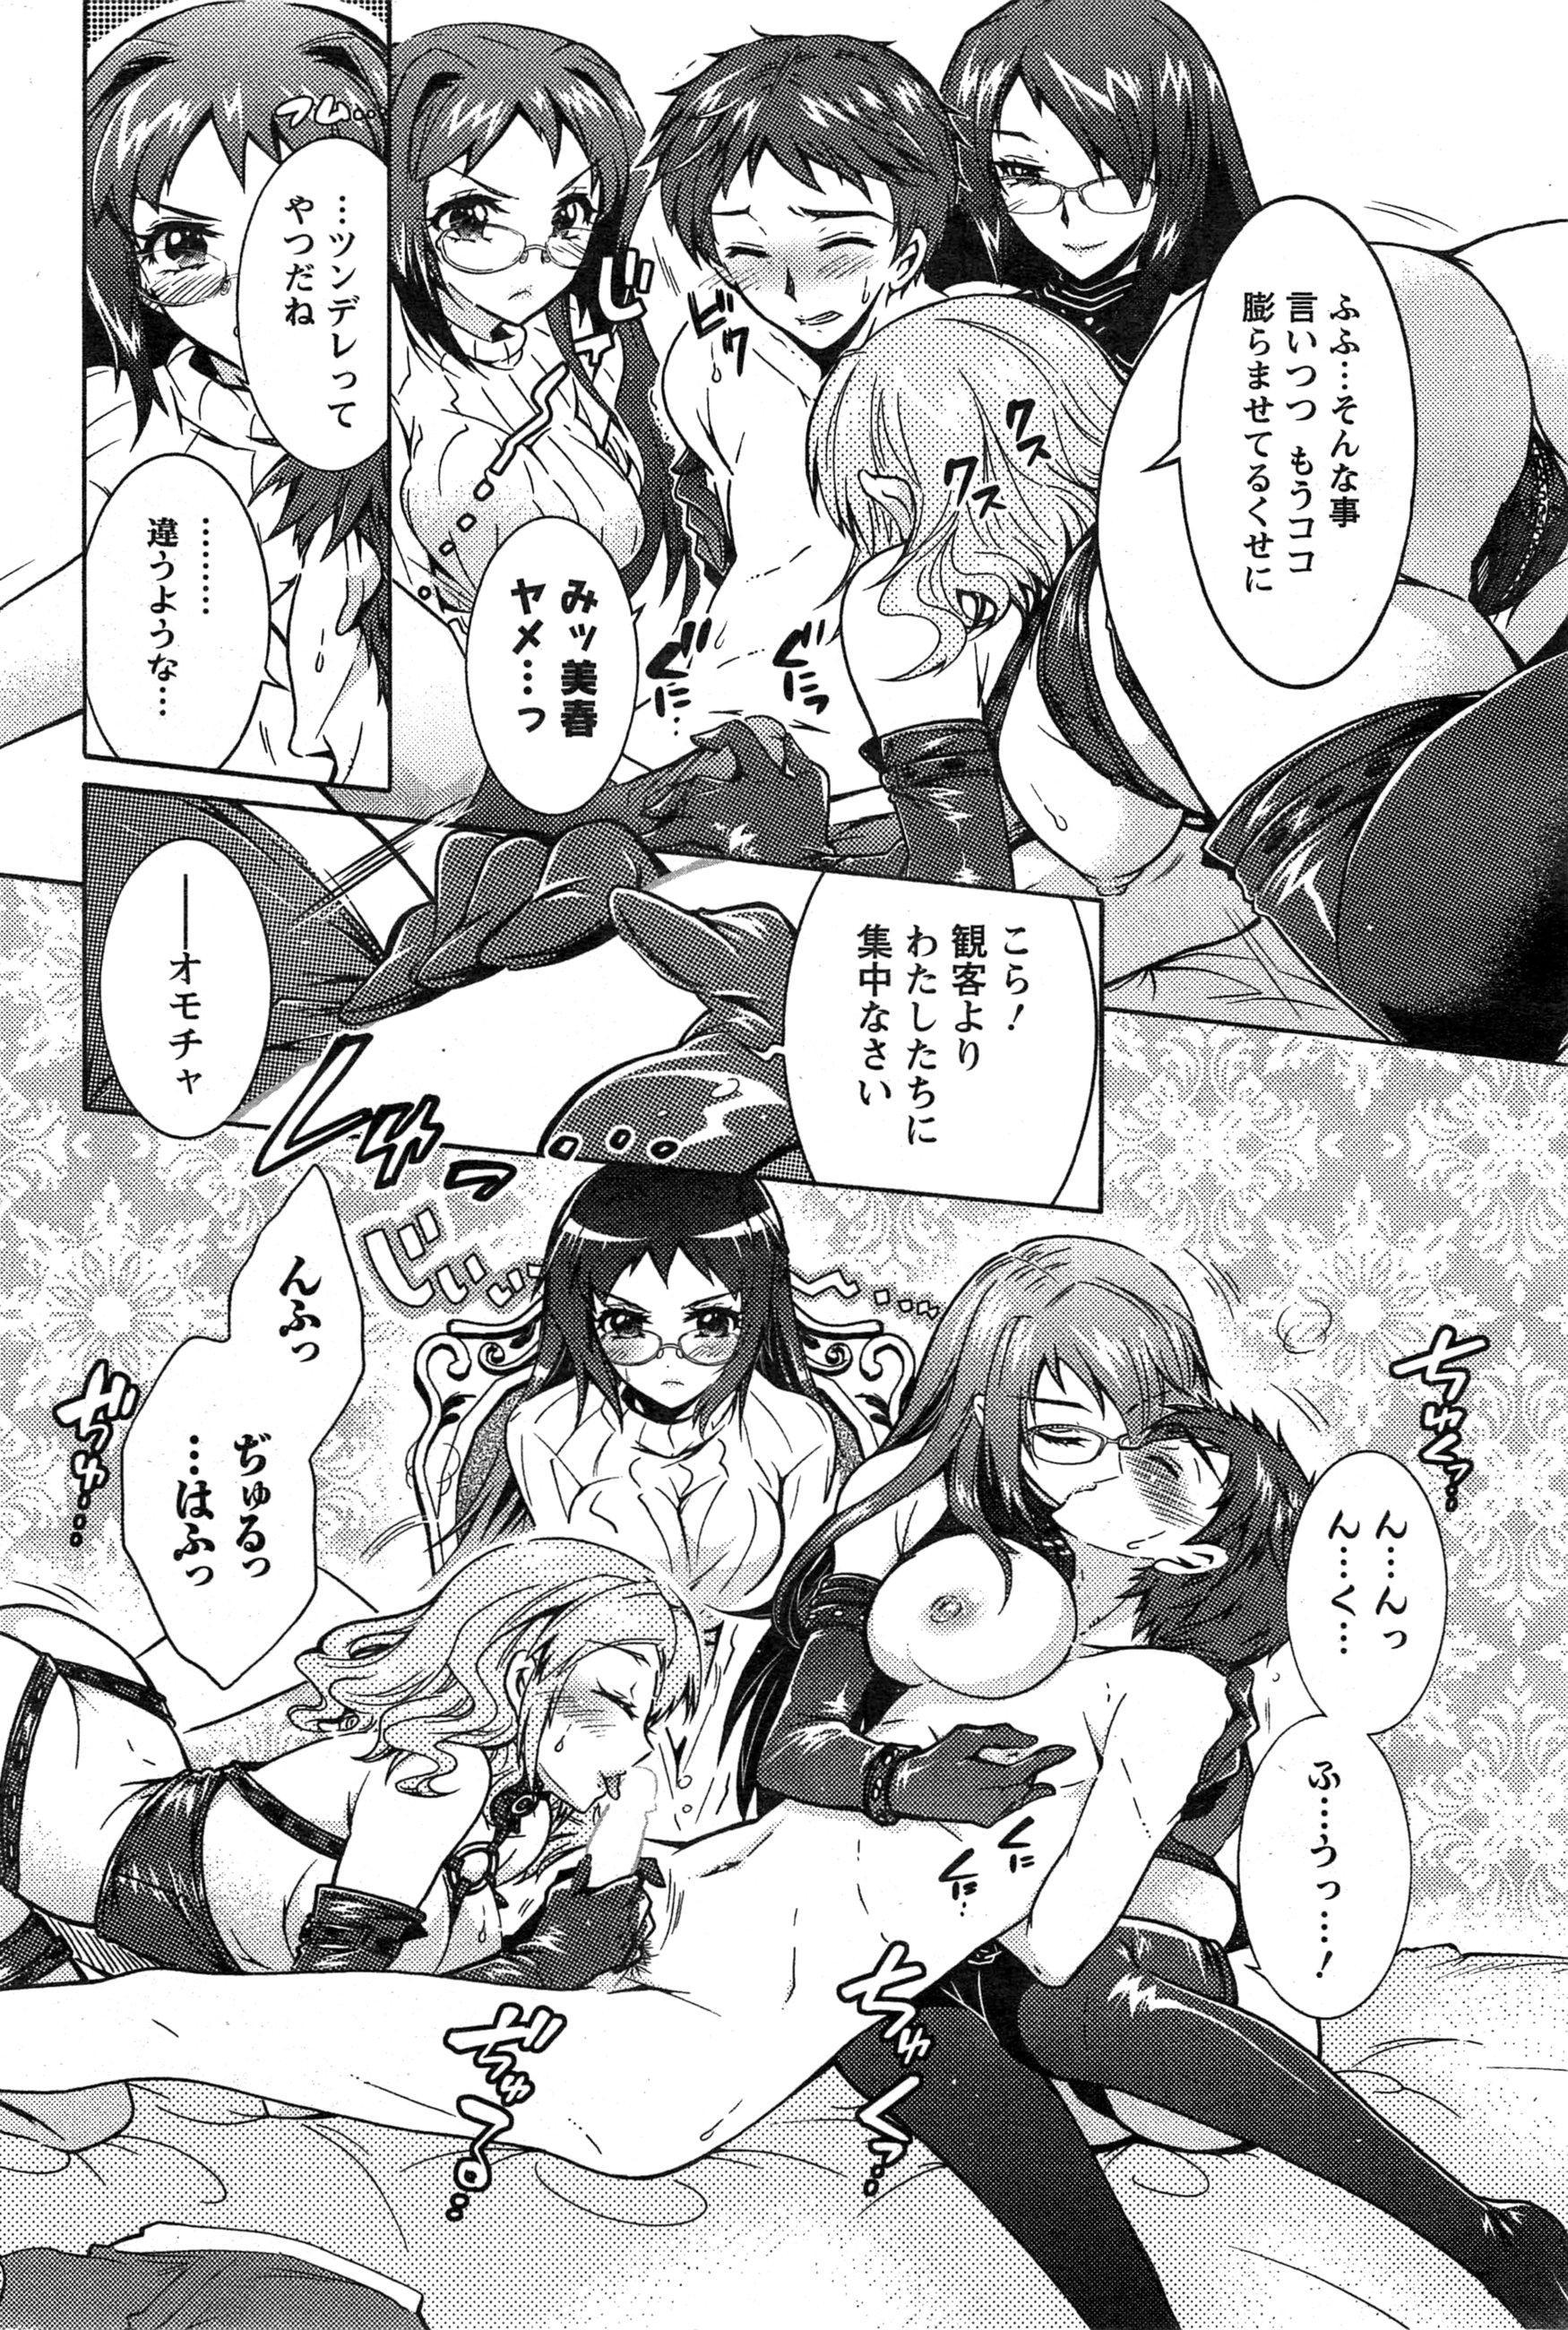 [Honda Arima] Sanshimai no Omocha - The Slave of Three Sisters Ch. 1-6 66